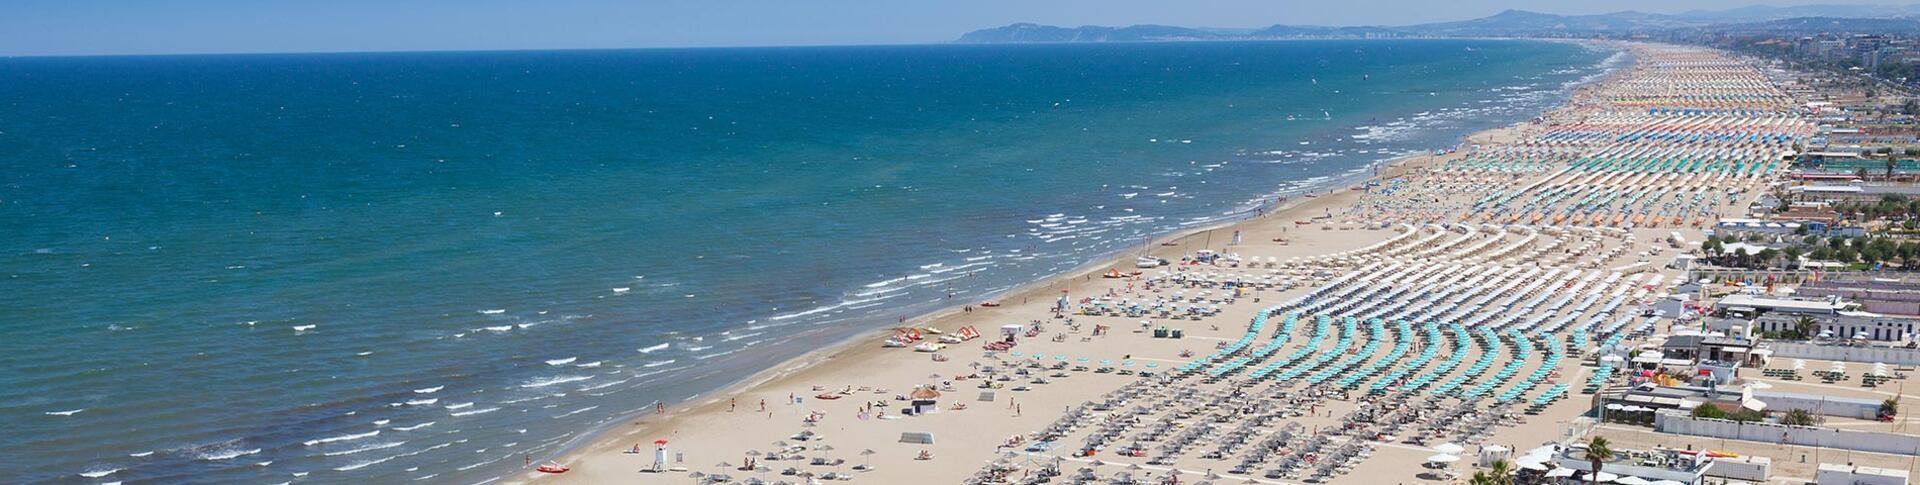 ariahotel it offerte-vacanze 013